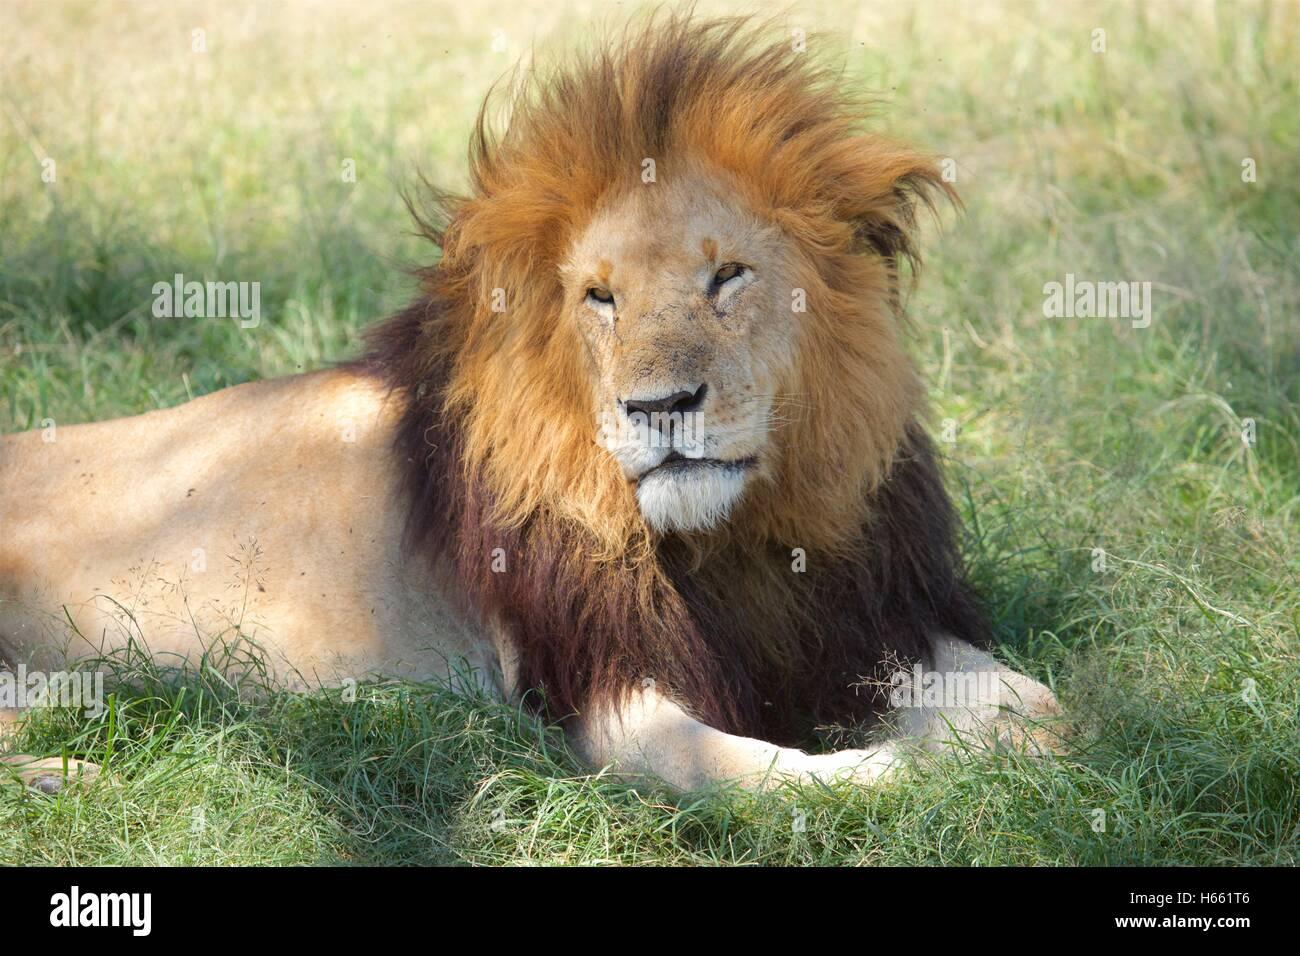 Wild male lion on safari in Masai Mara, Kenya. - Stock Image